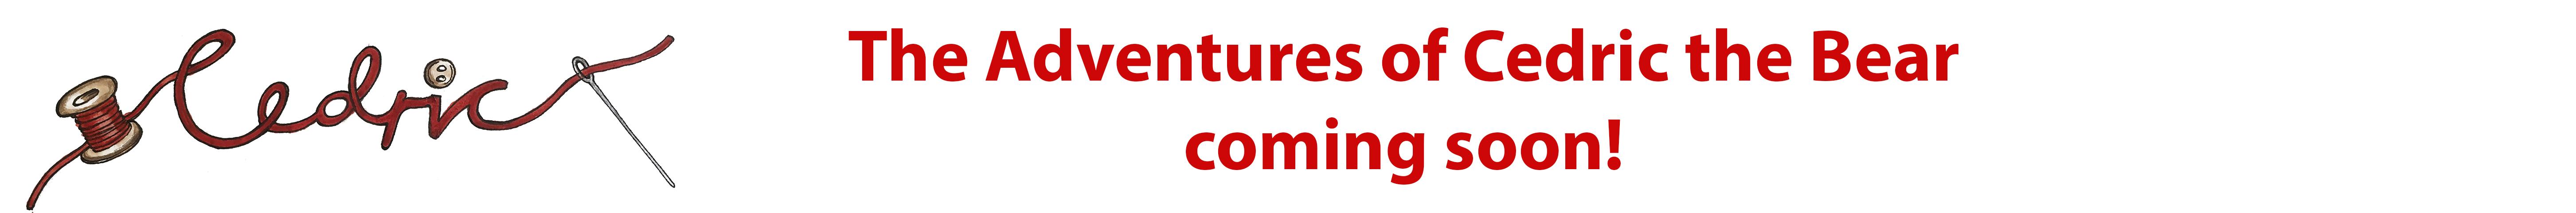 Cedric Cover Title header publishing announcement